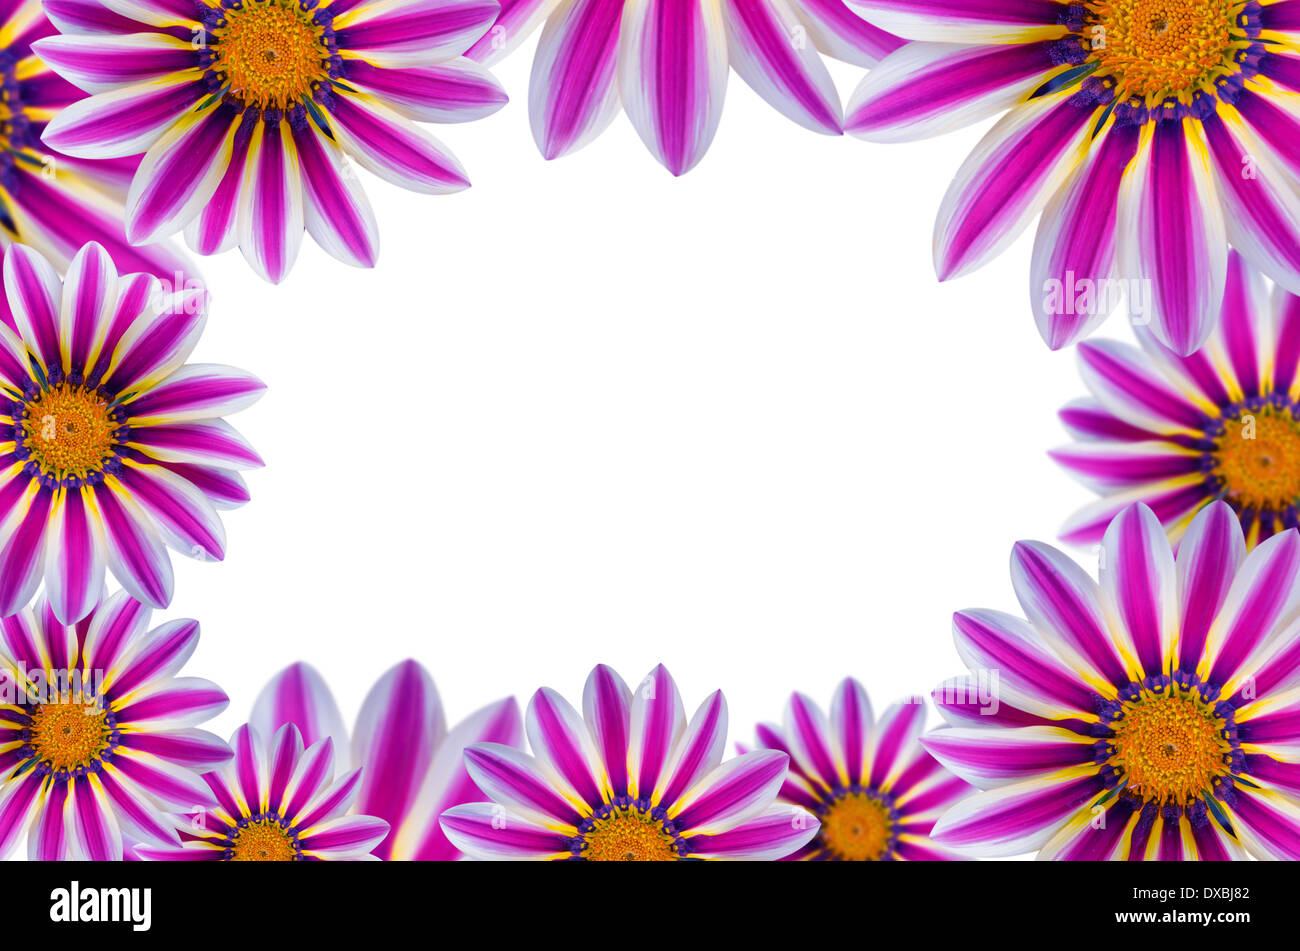 Daisy flowers border copy space stock photos daisy flowers border daisy flowers border with copy space flower background stock image izmirmasajfo